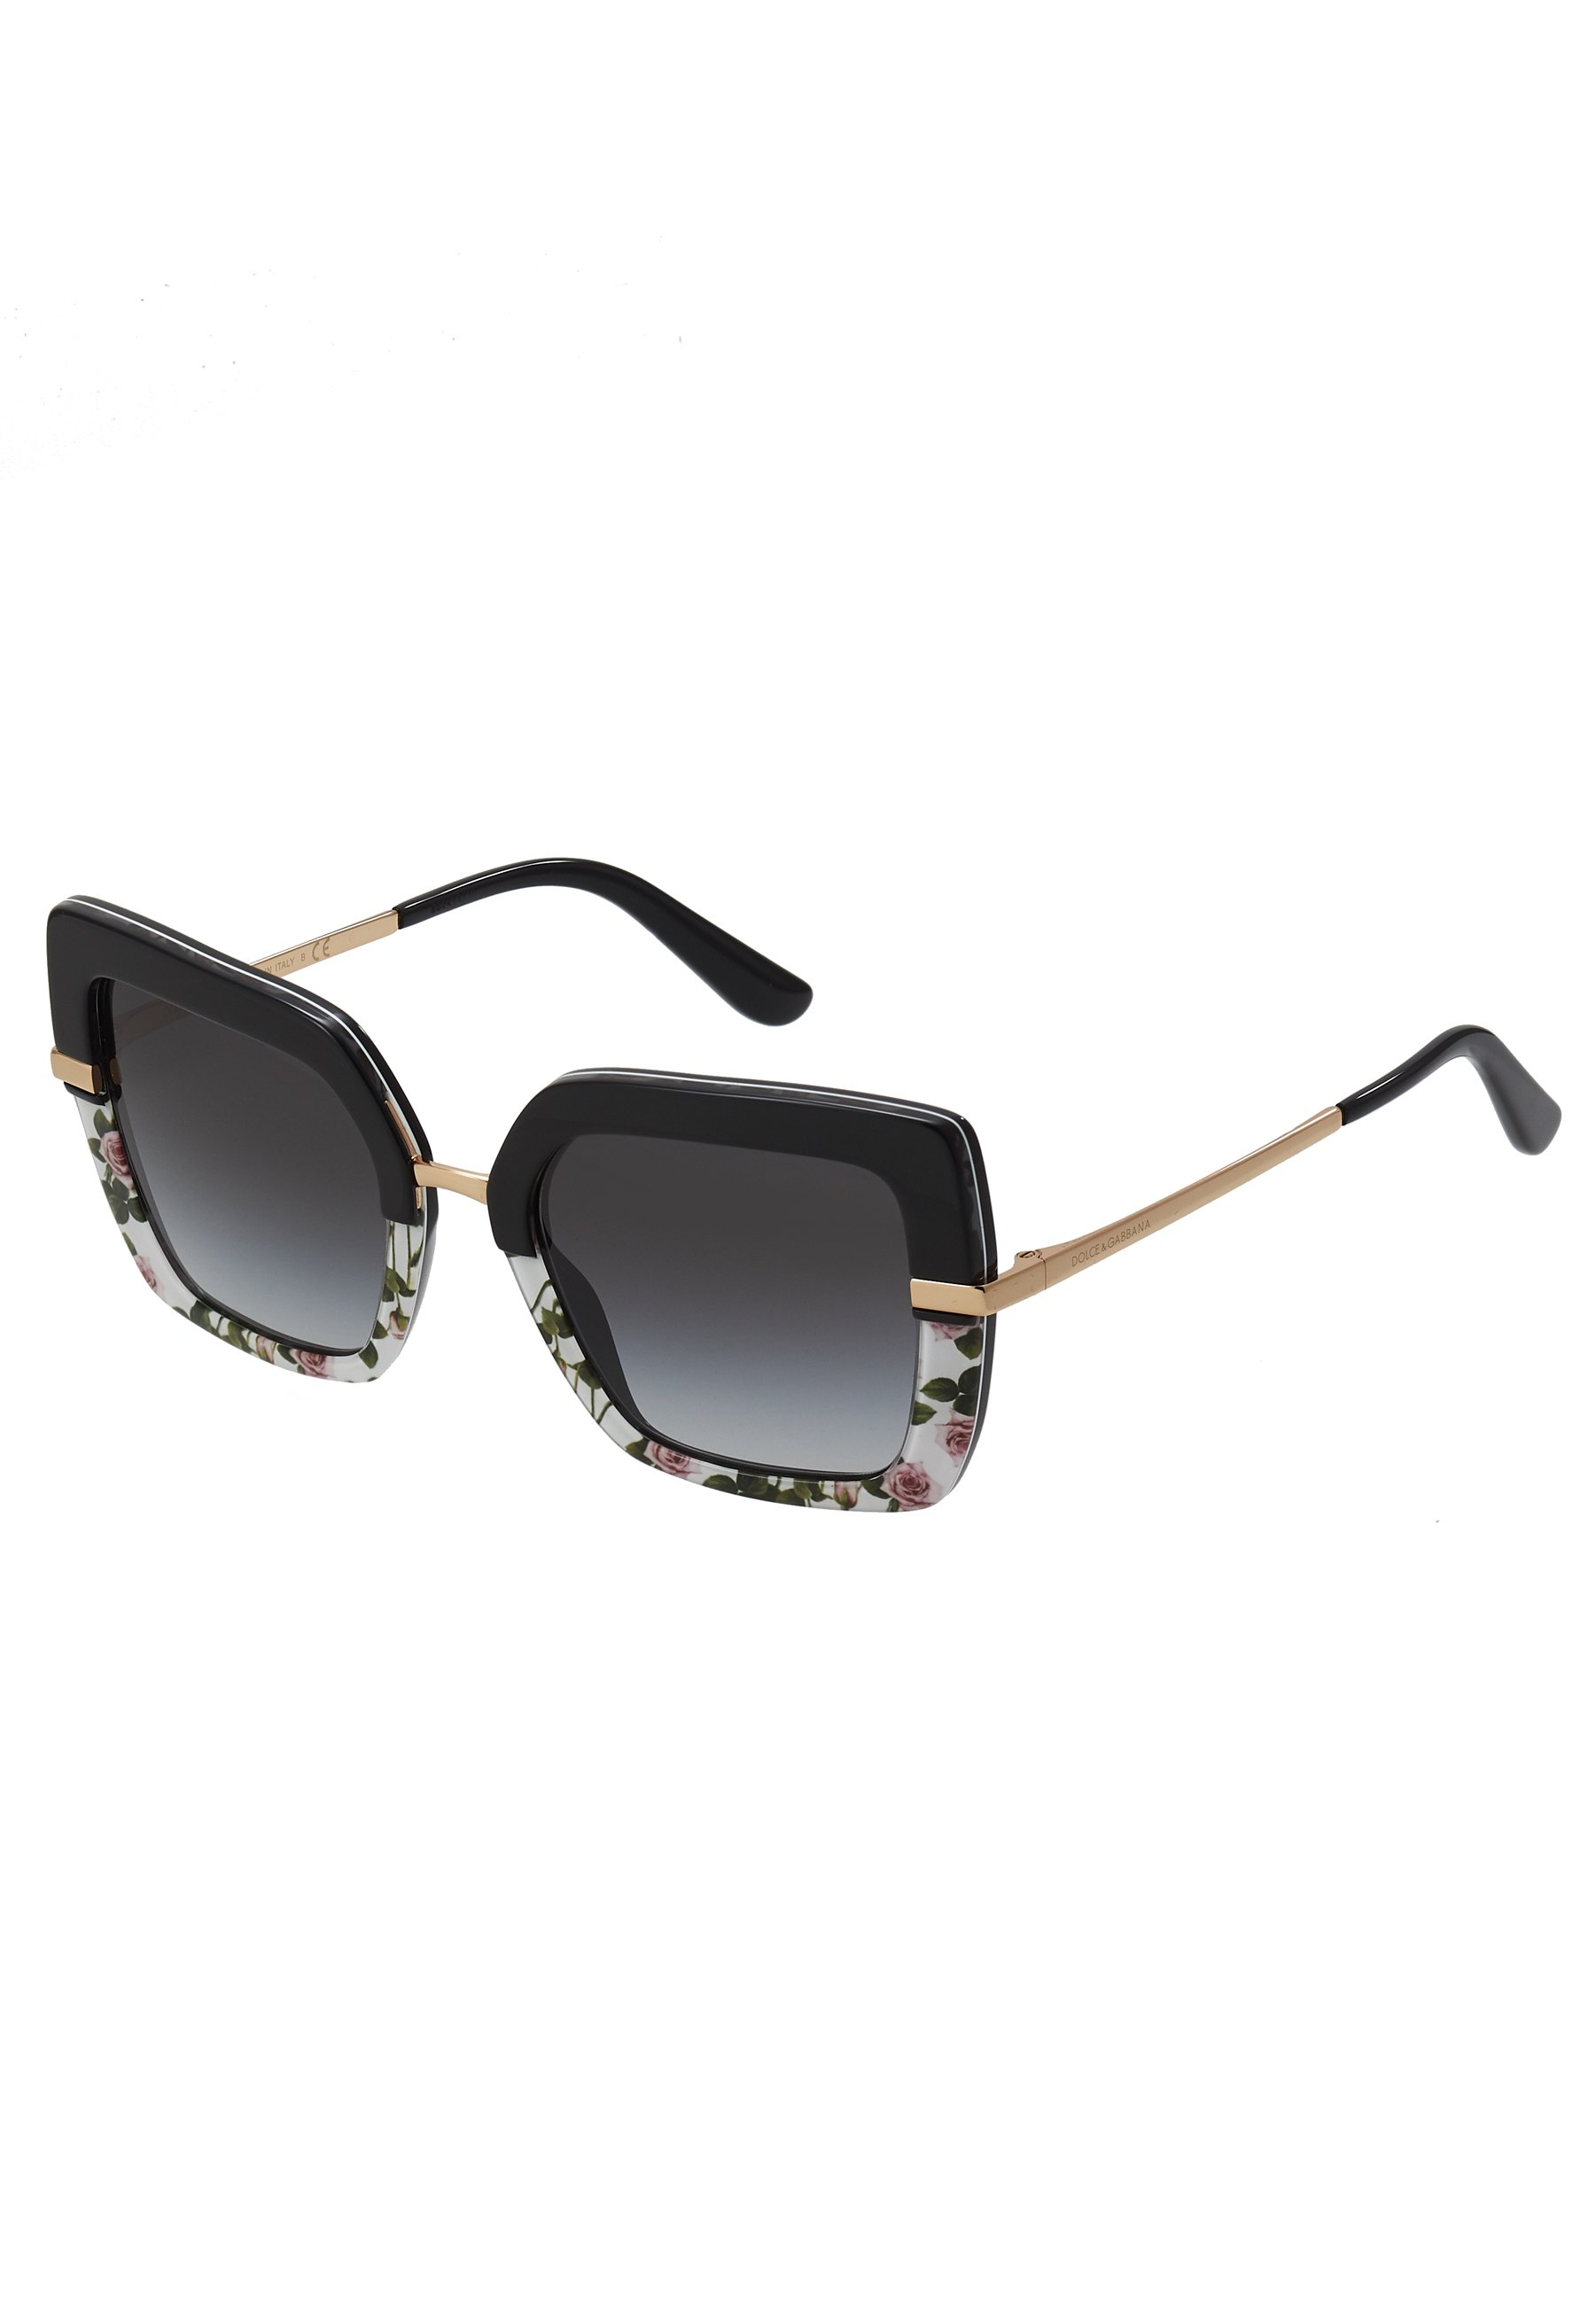 Dolce&Gabbana Sunglasses - black